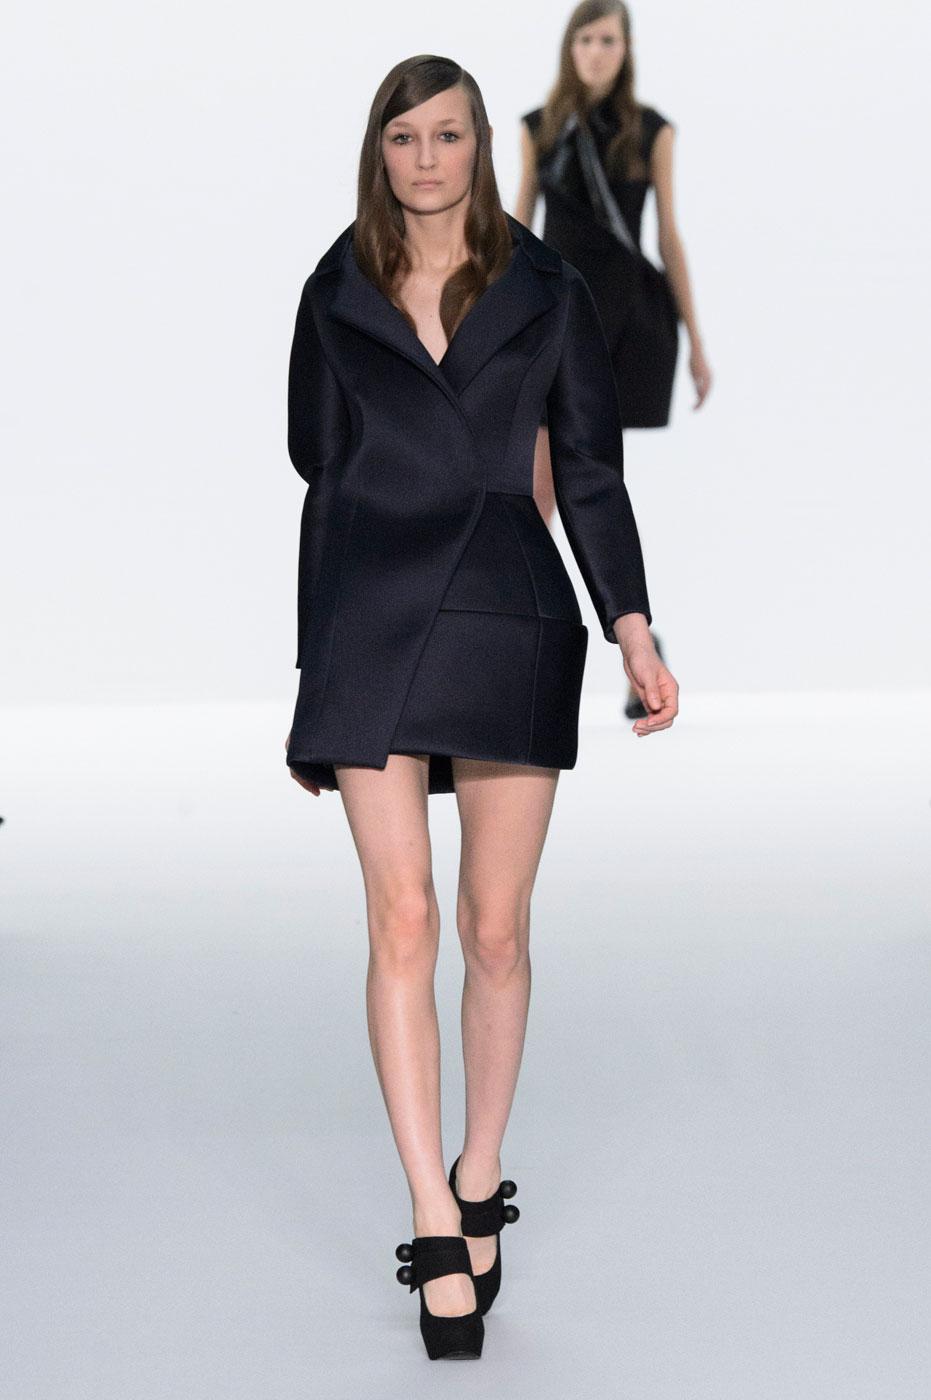 Kayek-fashion-runway-show-haute-couture-paris-spring-summer-2015-the-impression-01